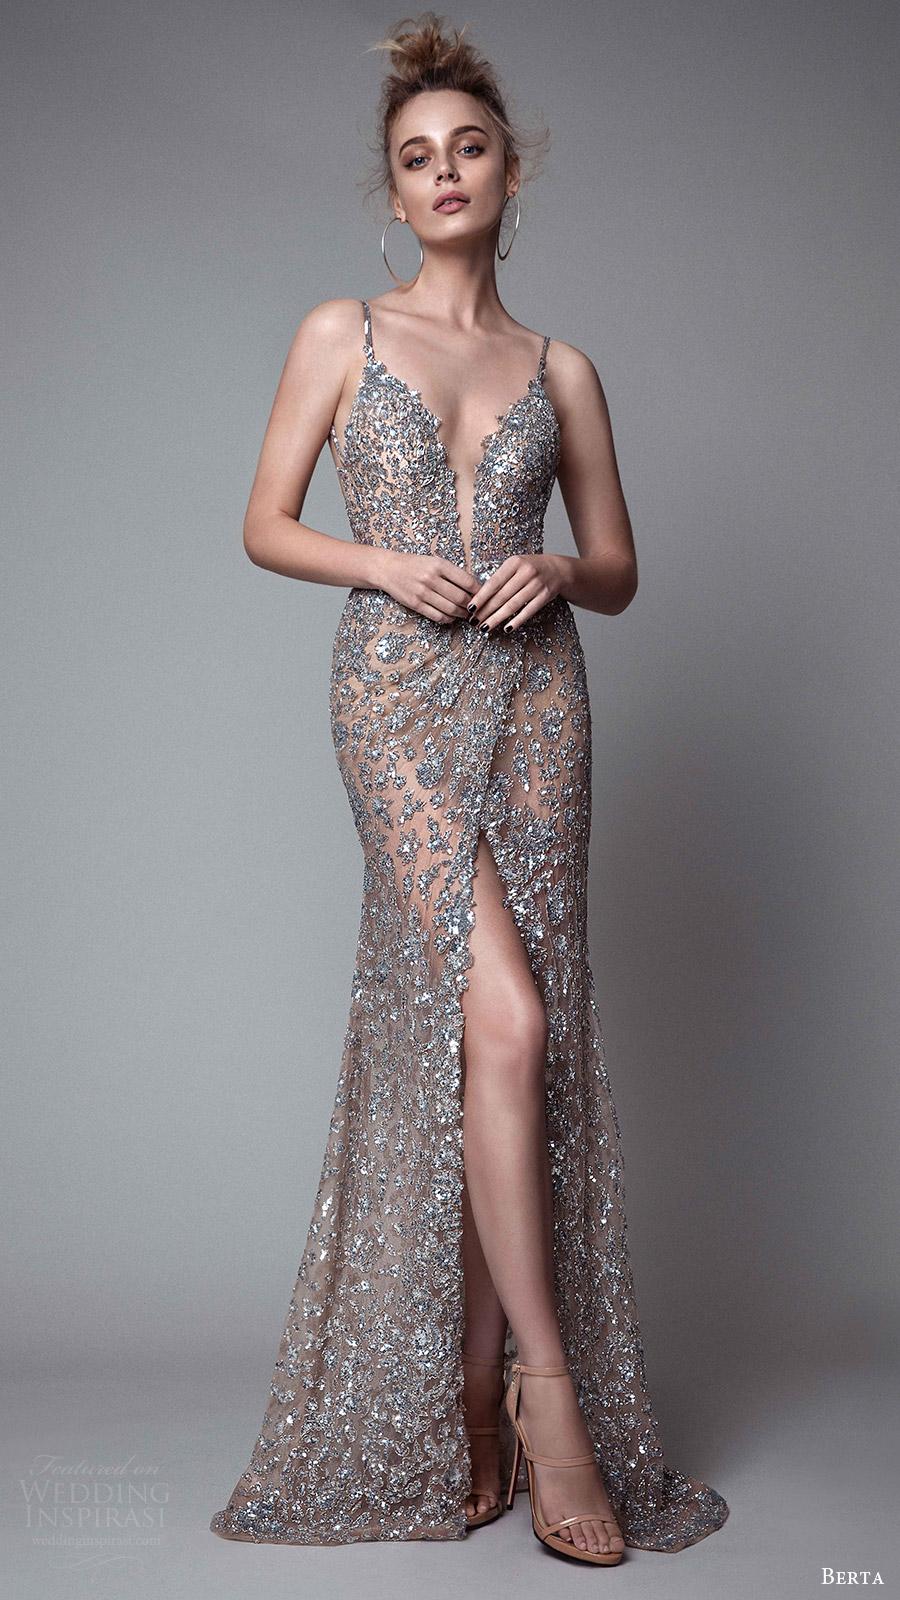 berta rtw fall 2017 (17 29) sleeveless deep v neck sheath metallic evening dress slit skirt spaghetti straps mv